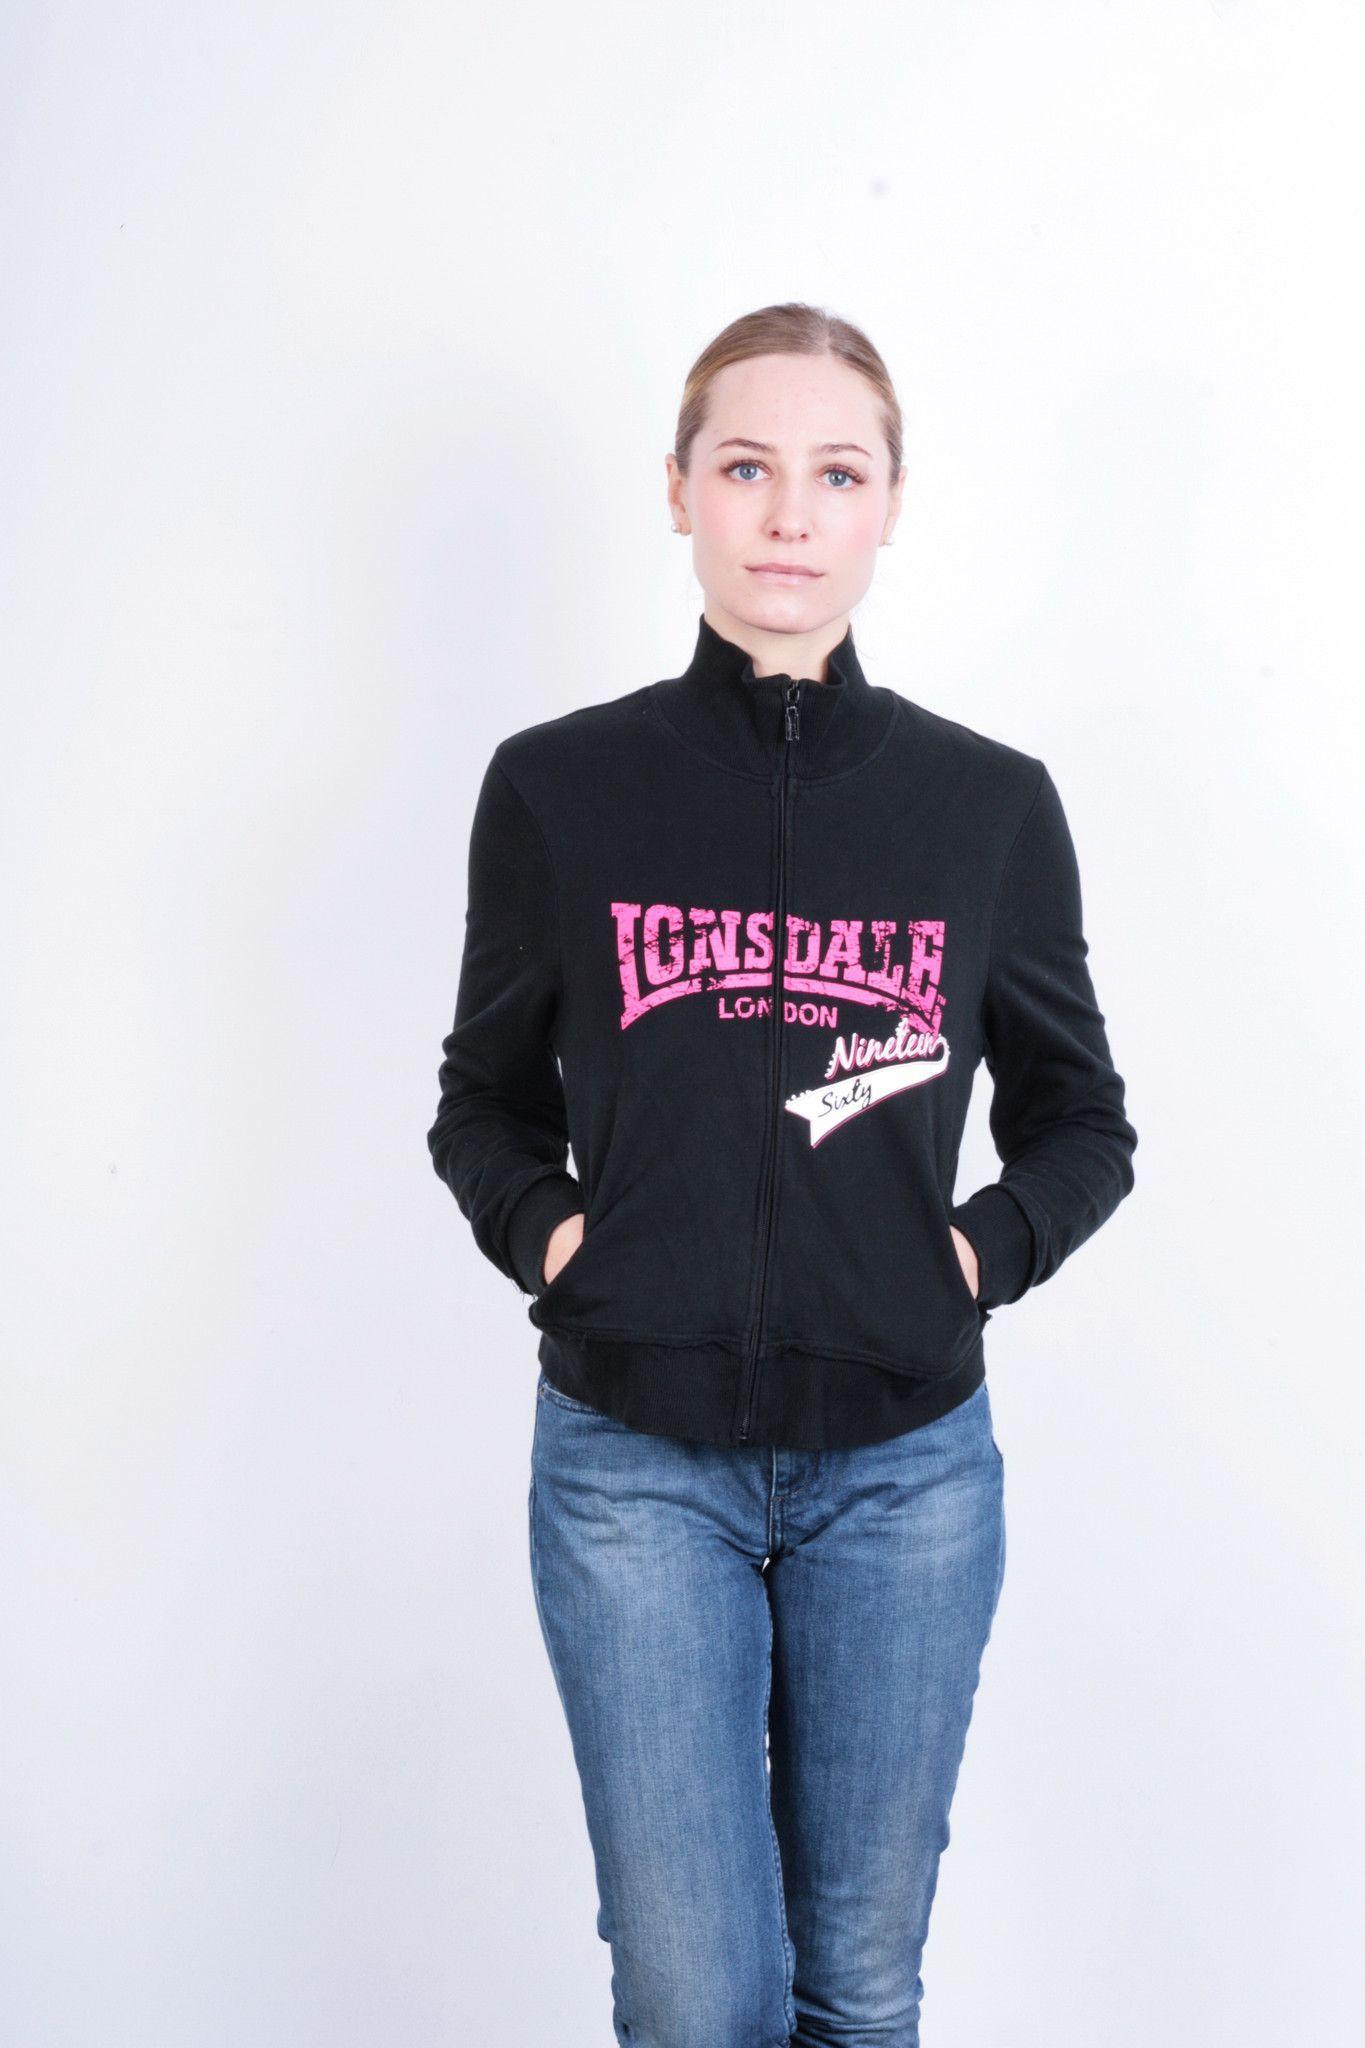 4e49e70febe7 Lonsdale London Womens 12 M Sweatshirt Black Sport Jumper Cotton Sport